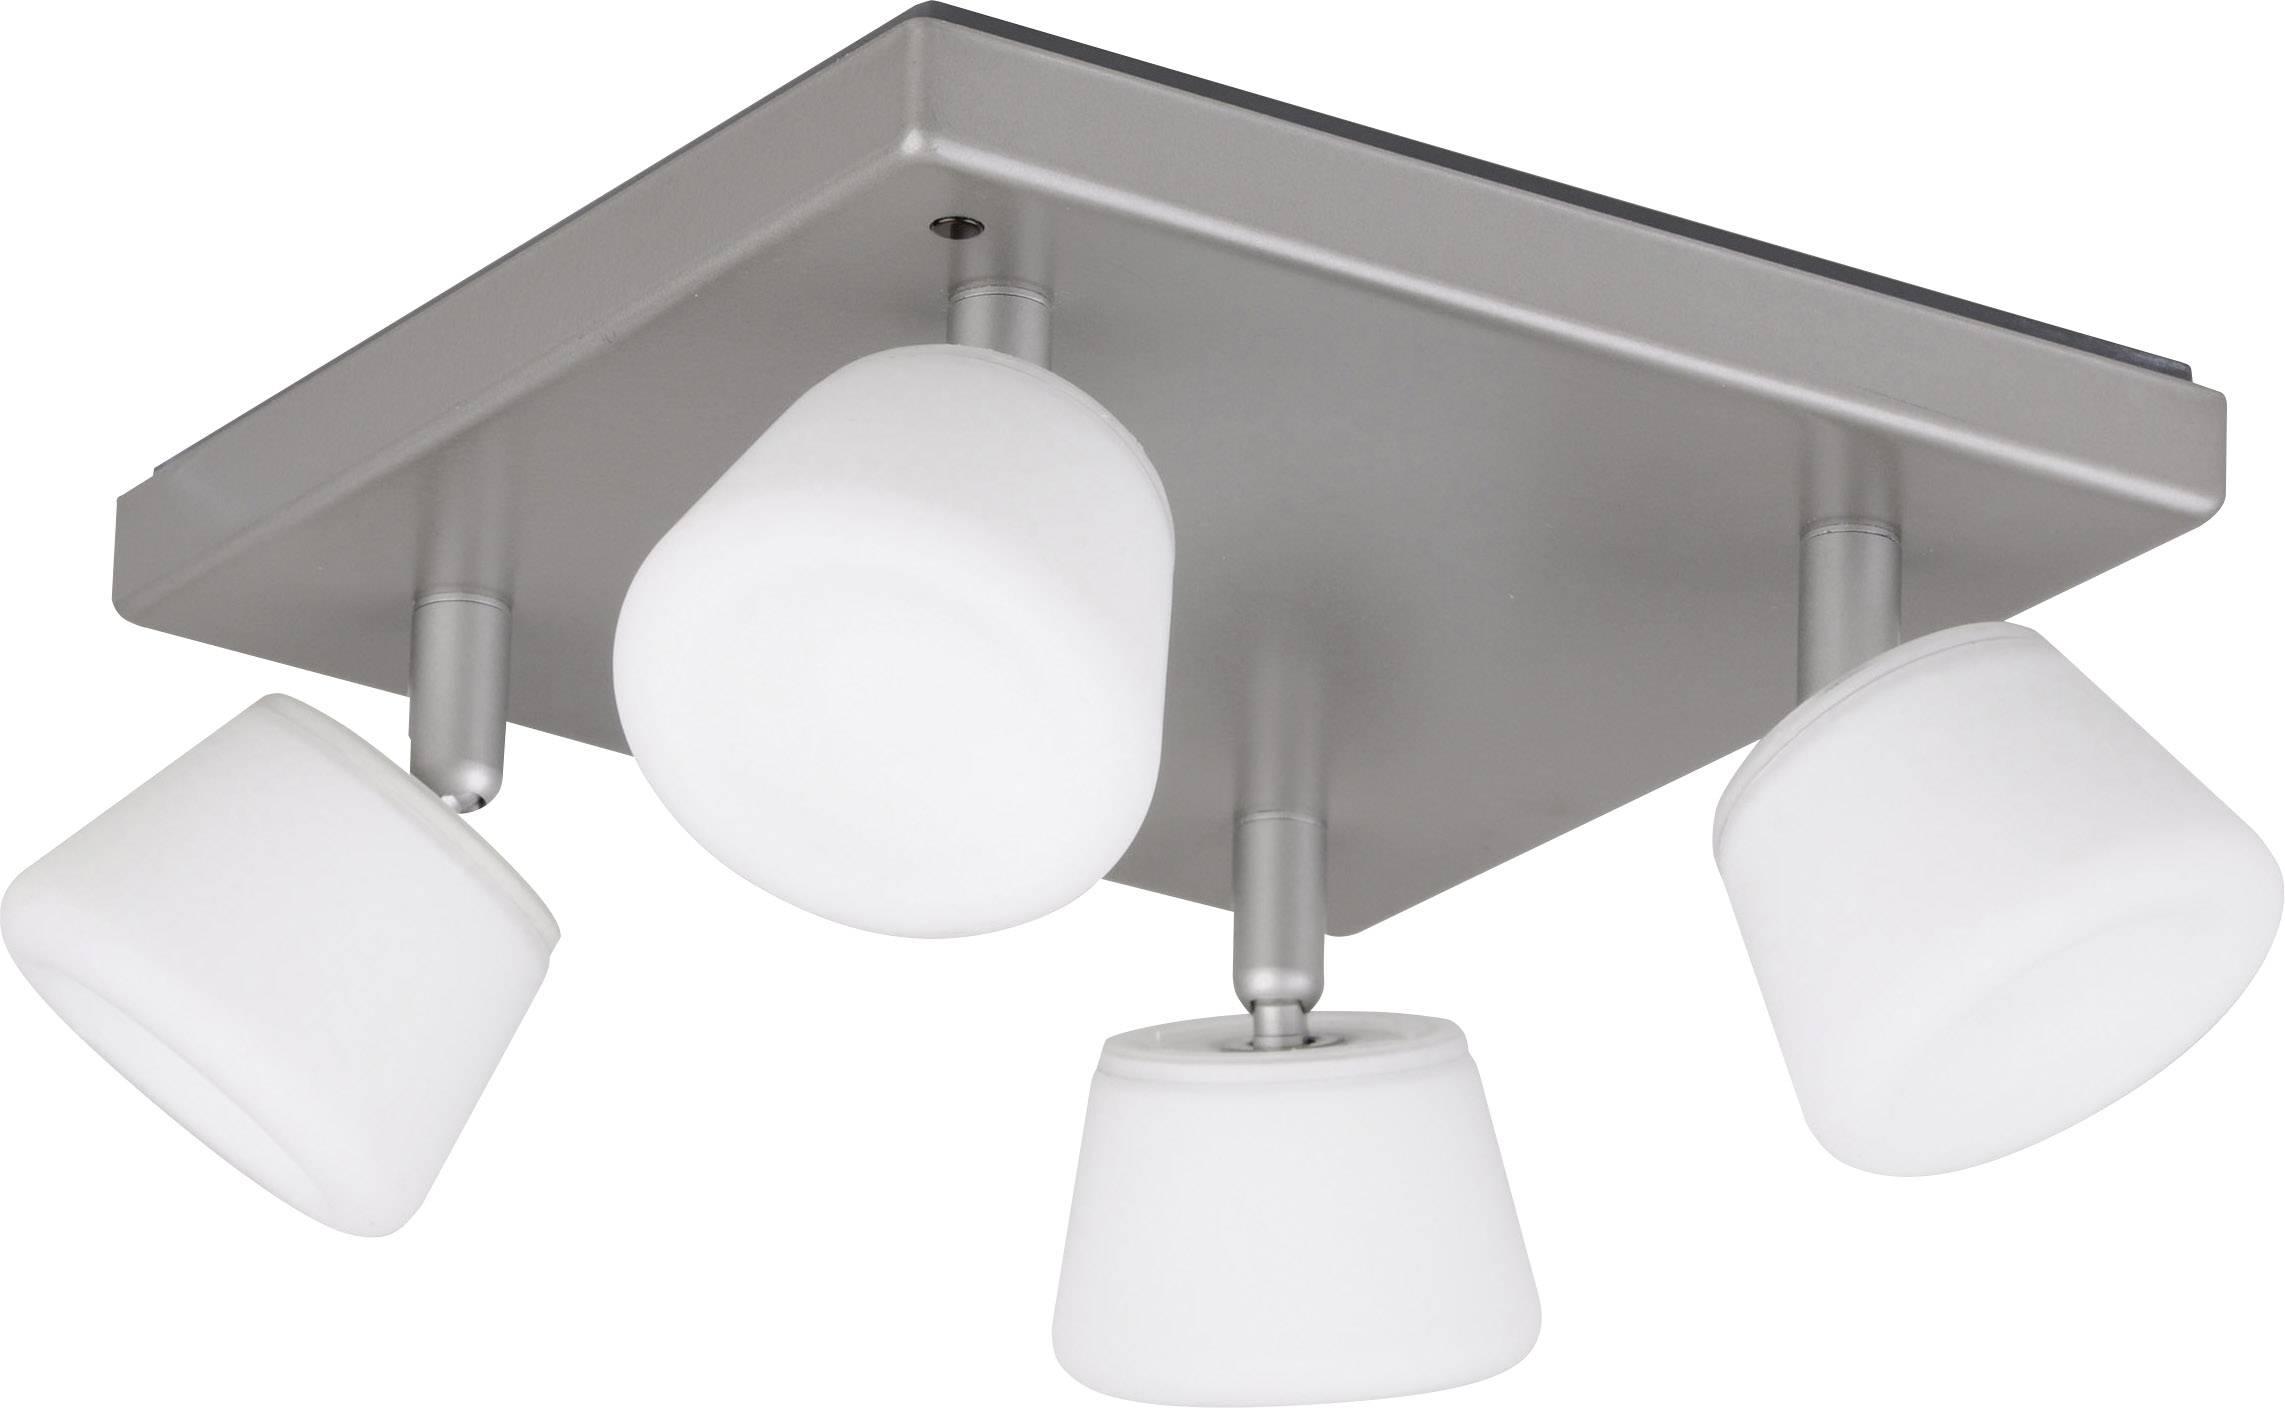 LED-plafondspot 24 W RGB JEDI Lighting Emerald JE23949 Grijs | Conrad.nl